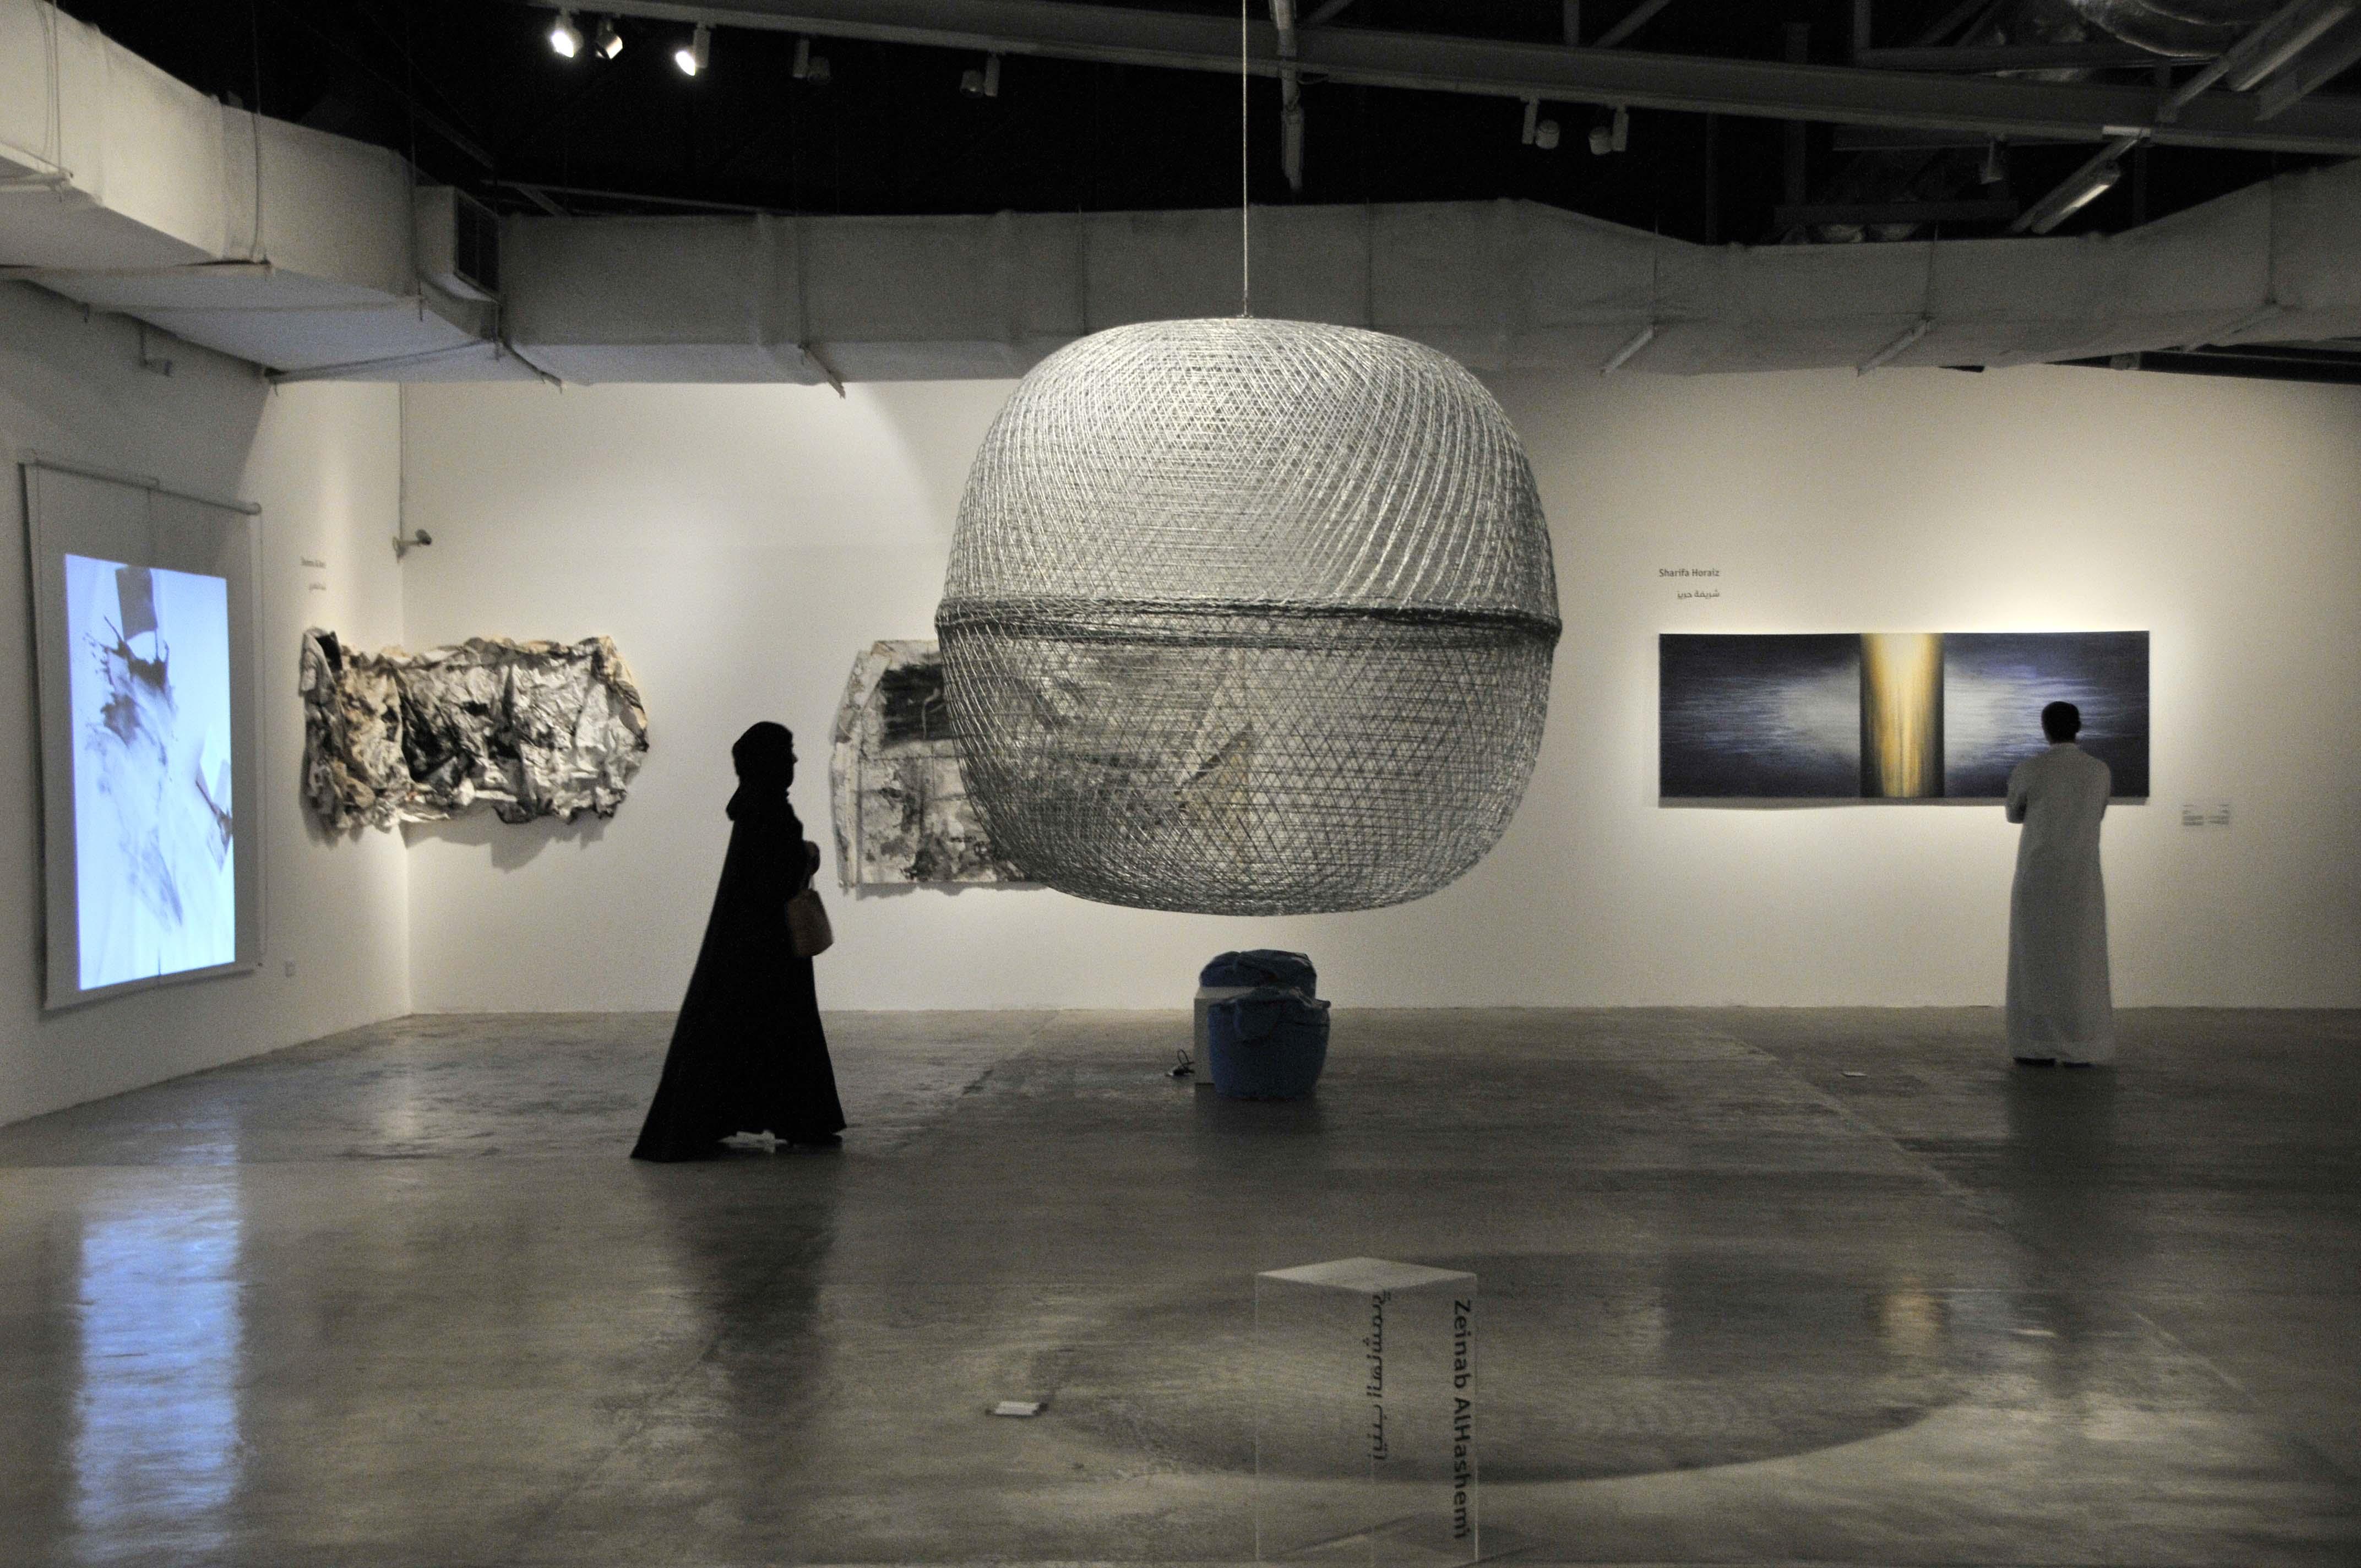 The Present, 2011